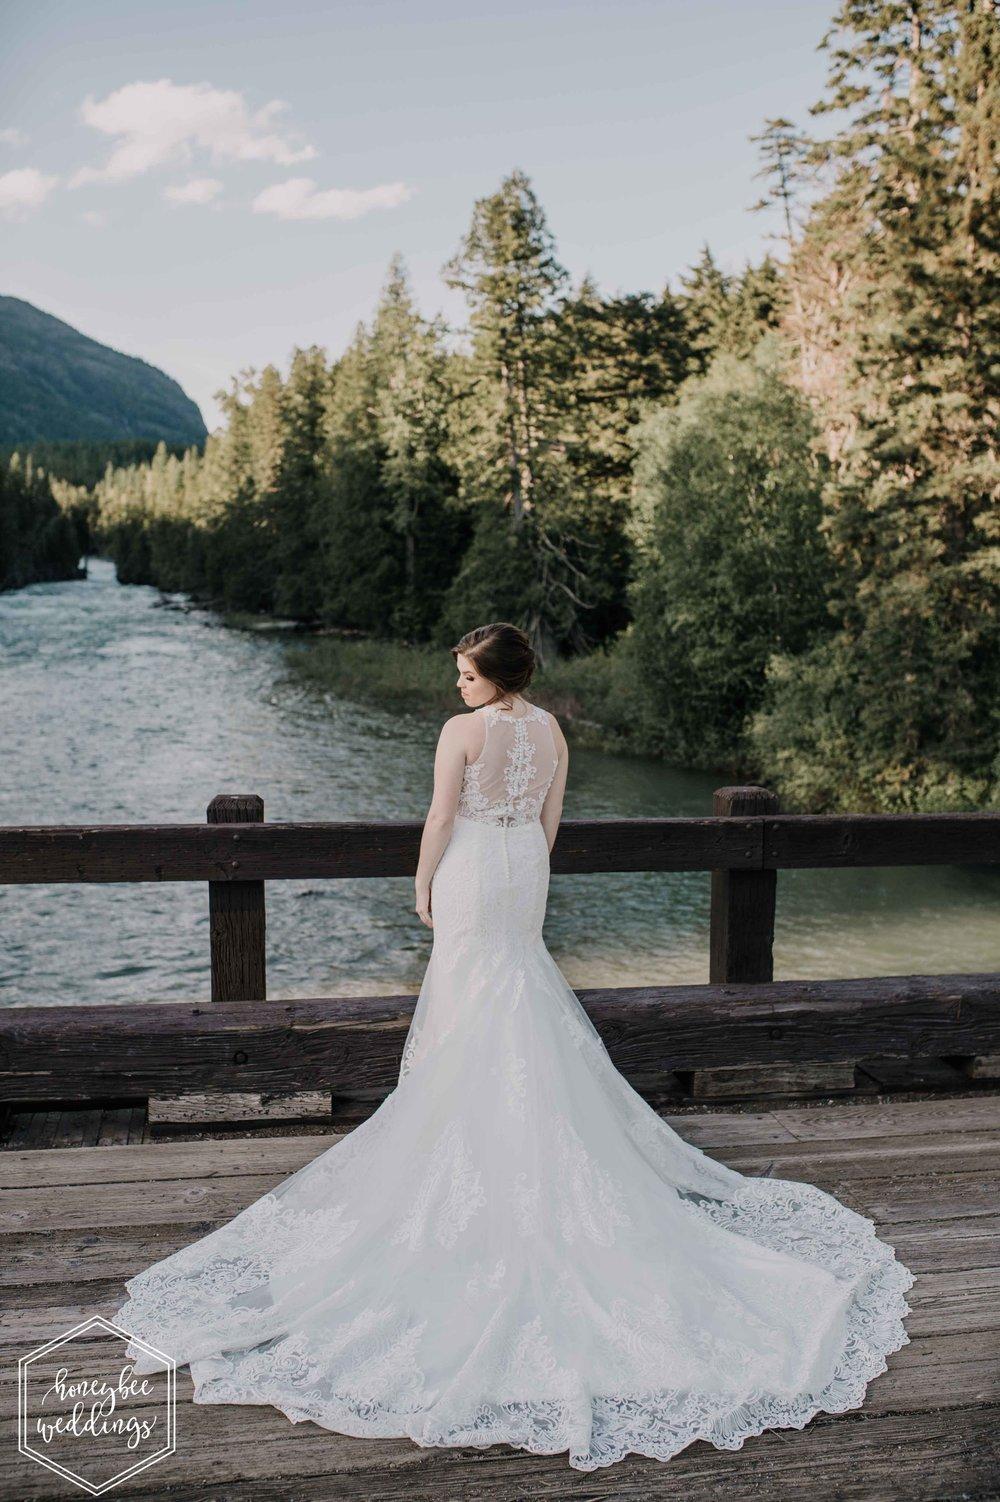 74 Glacier National Park Wedding_Burns 2018-4022-2.jpg